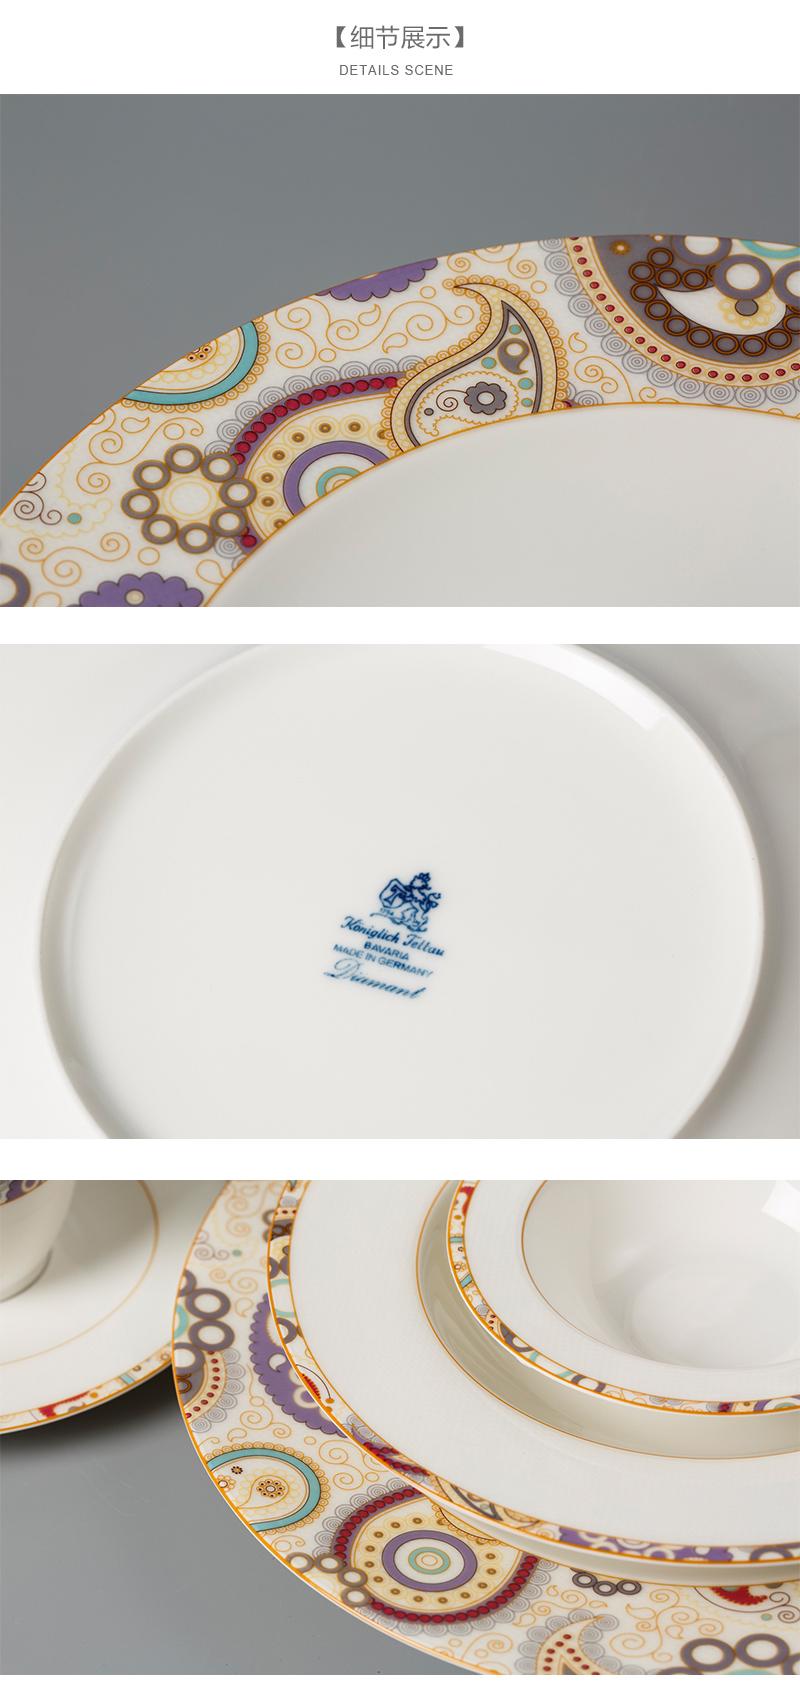 Seltmann Weiden陶瓷餐盘细节展示